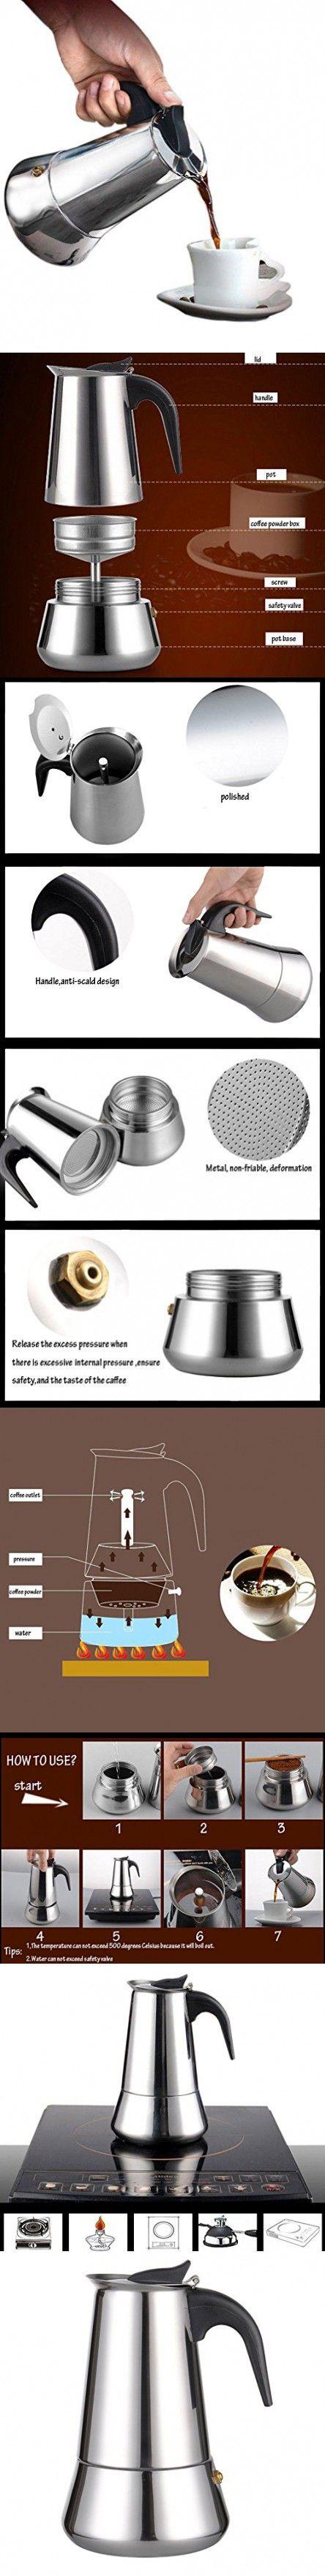 Generic ml cup stainless steel moka espresso latte percolator